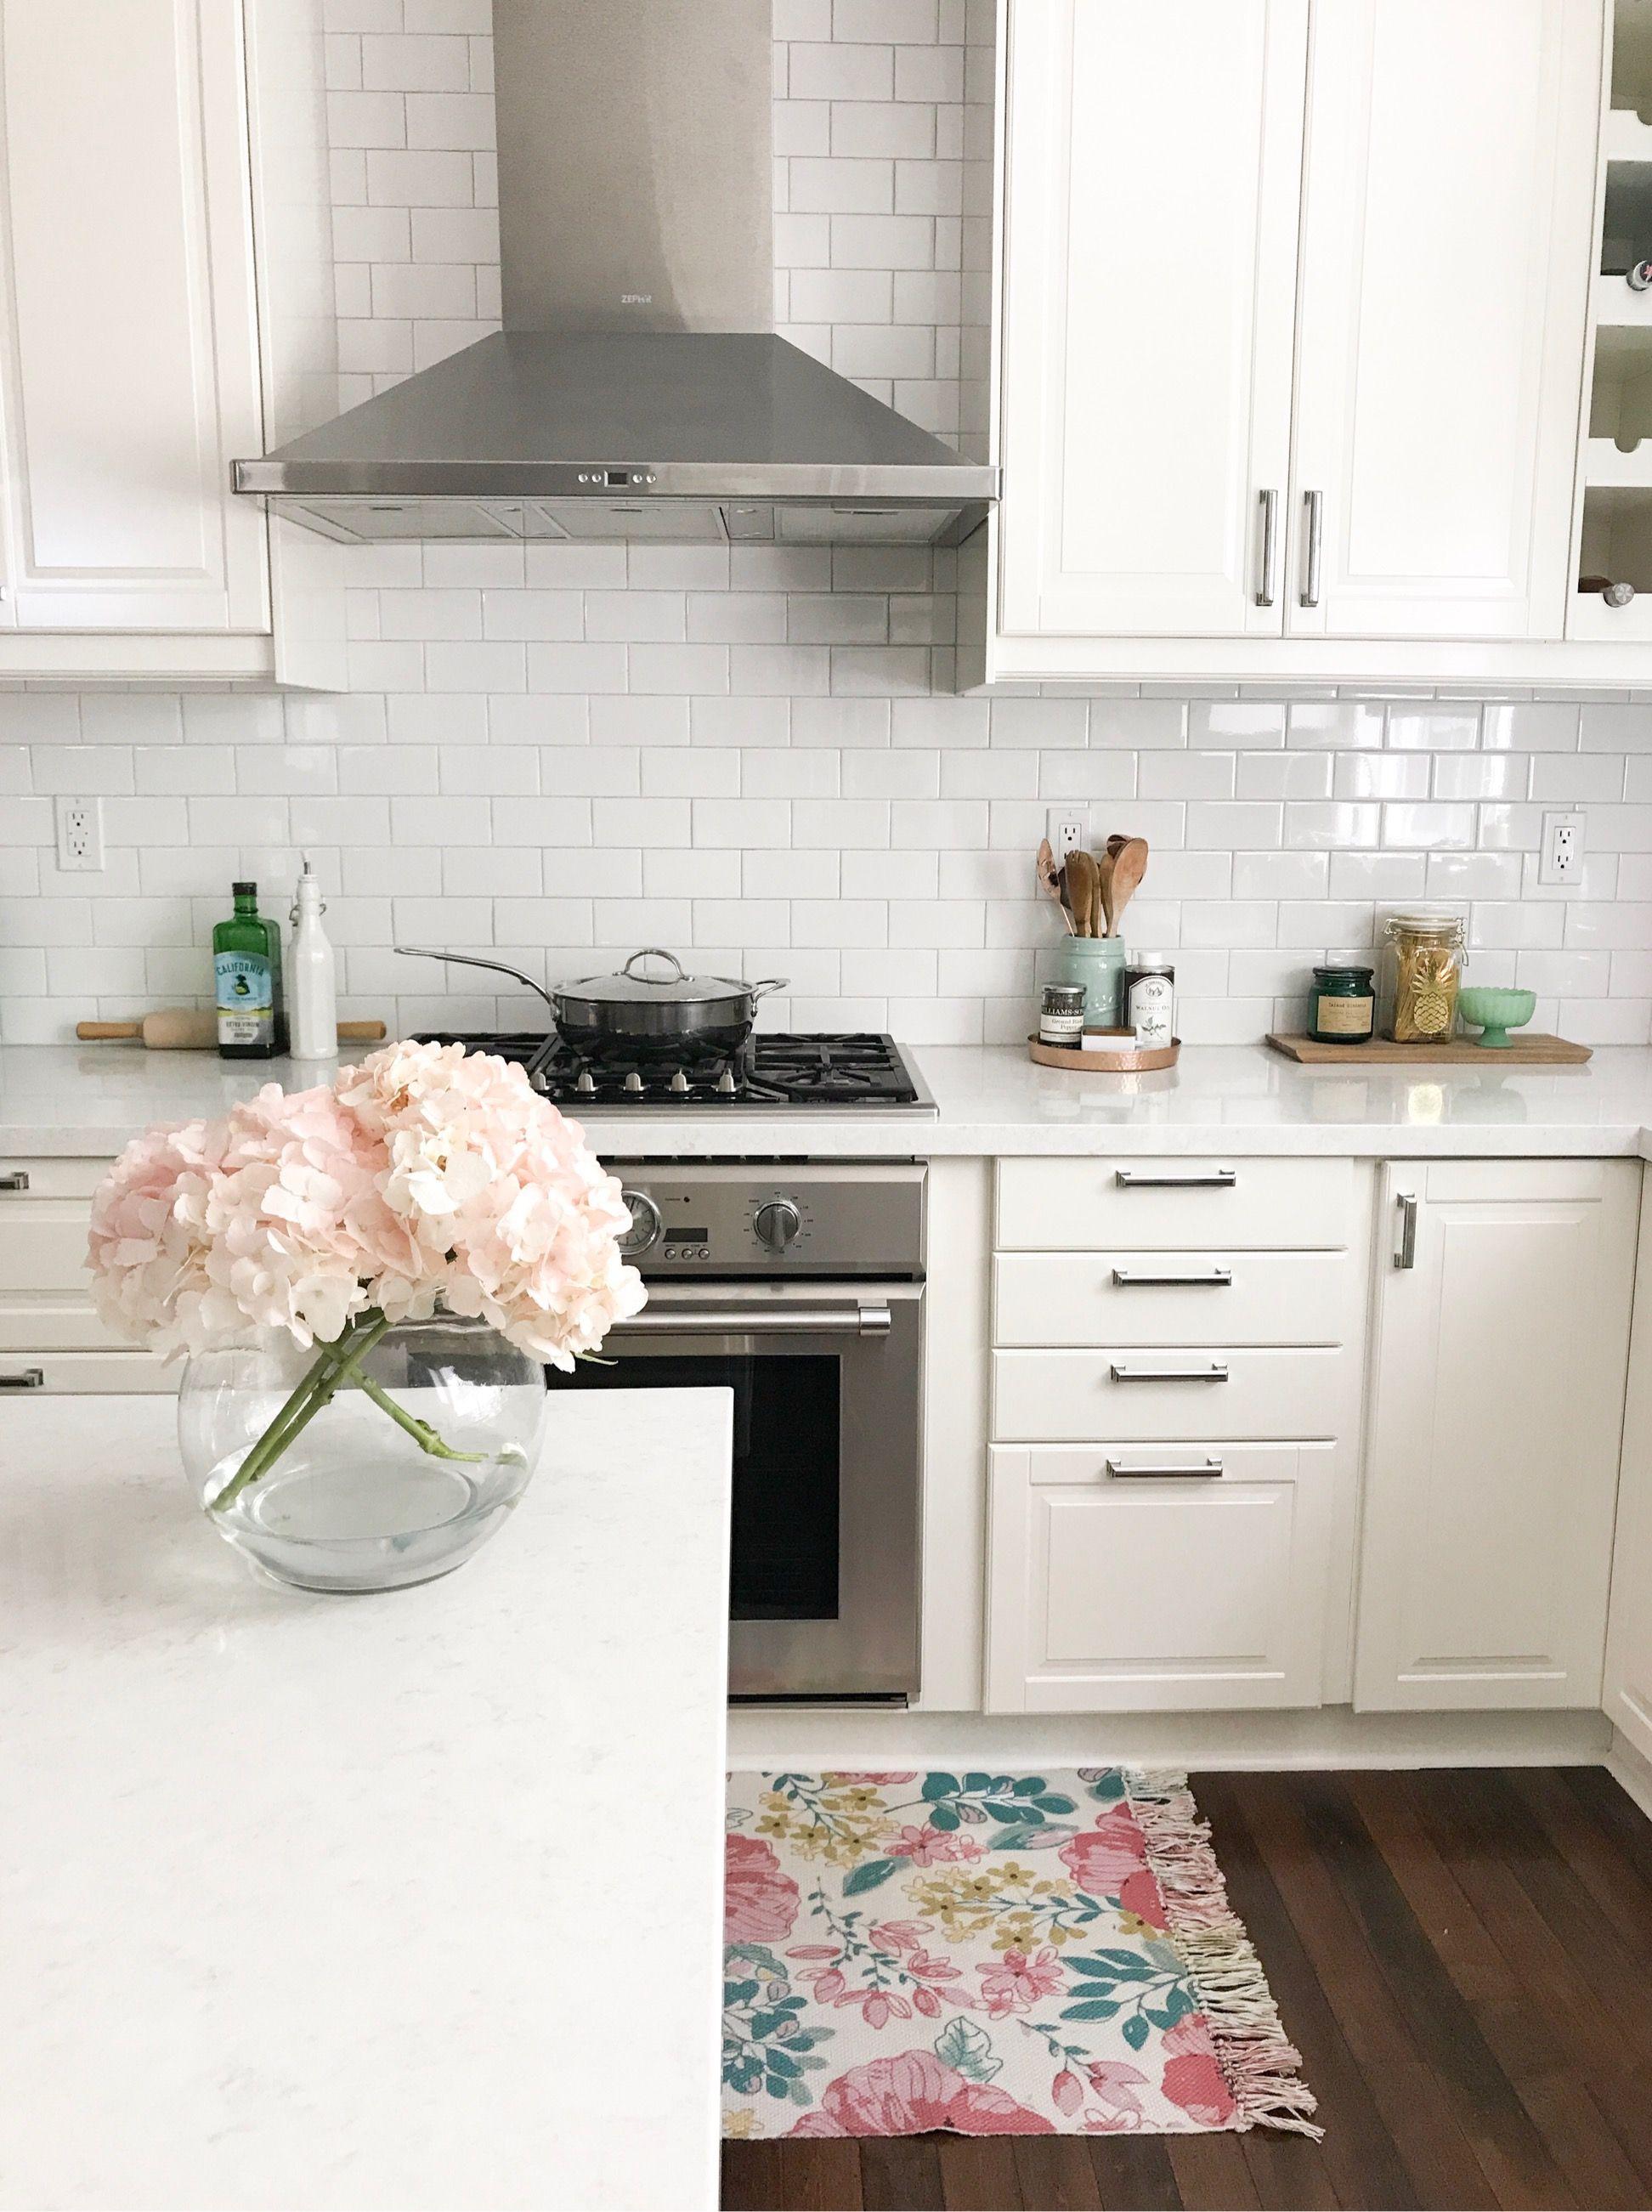 9+ Ikea kitchen remodel ideas in 9   LivingRoomReference